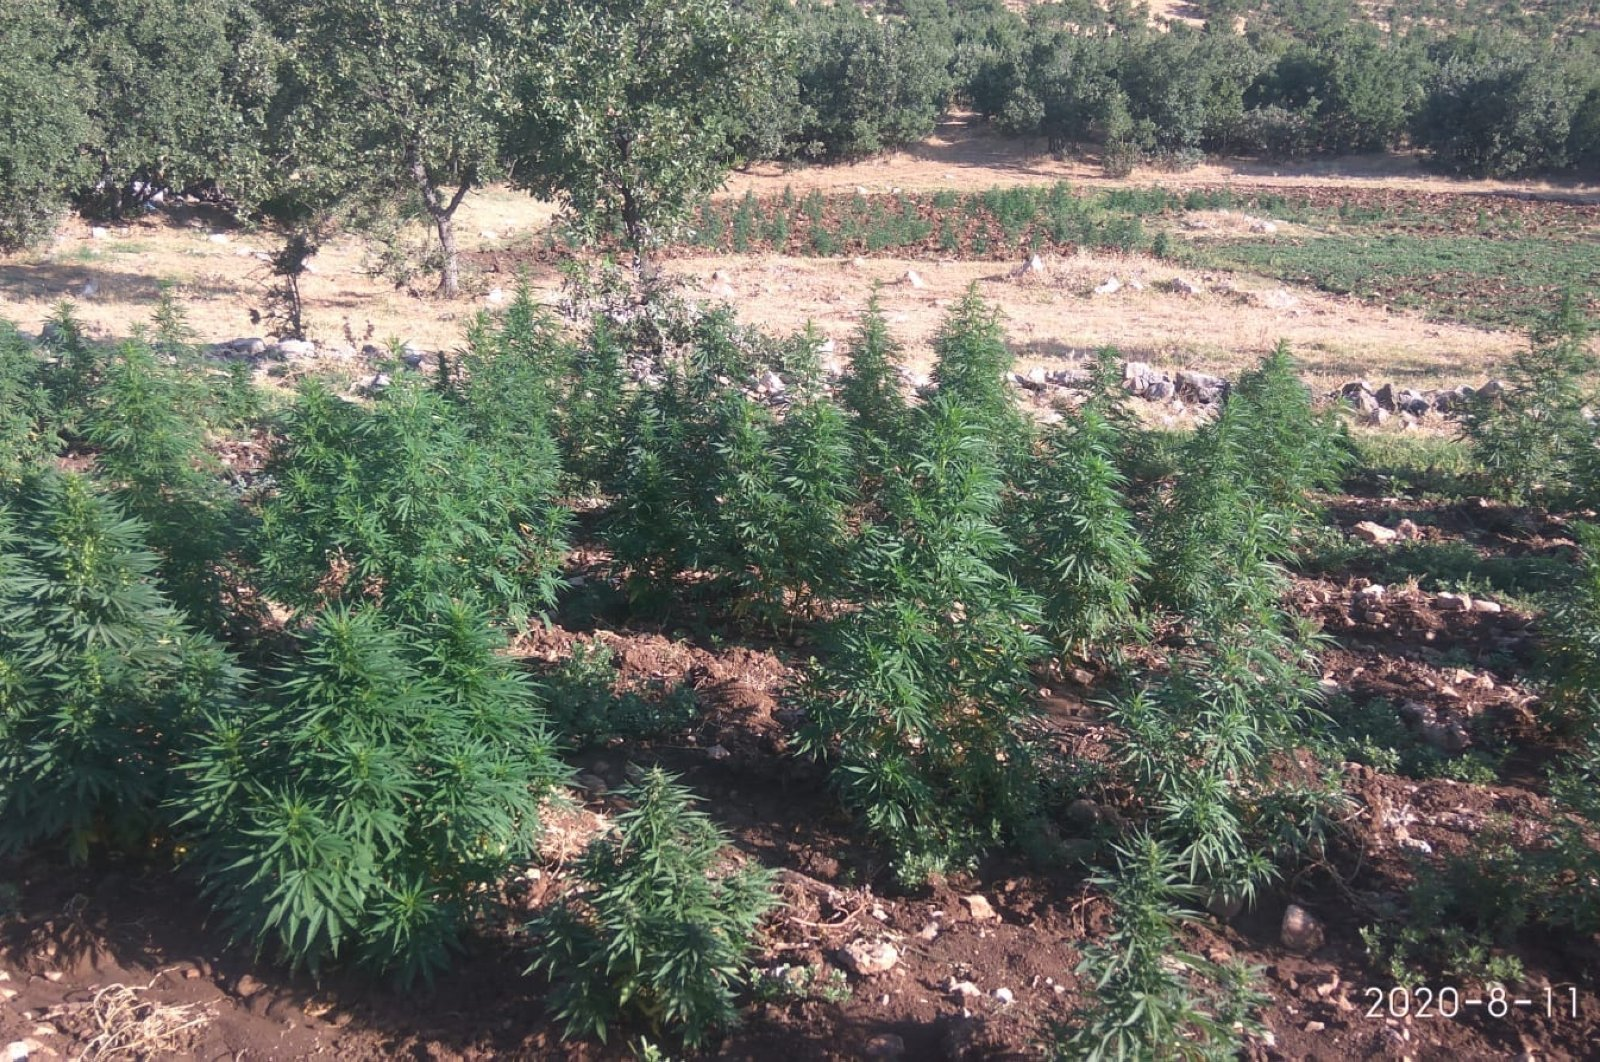 View of a cannabis field, in Diyarbakır, southeastern Turkey, Aug. 11, 2020. (AA Photo)